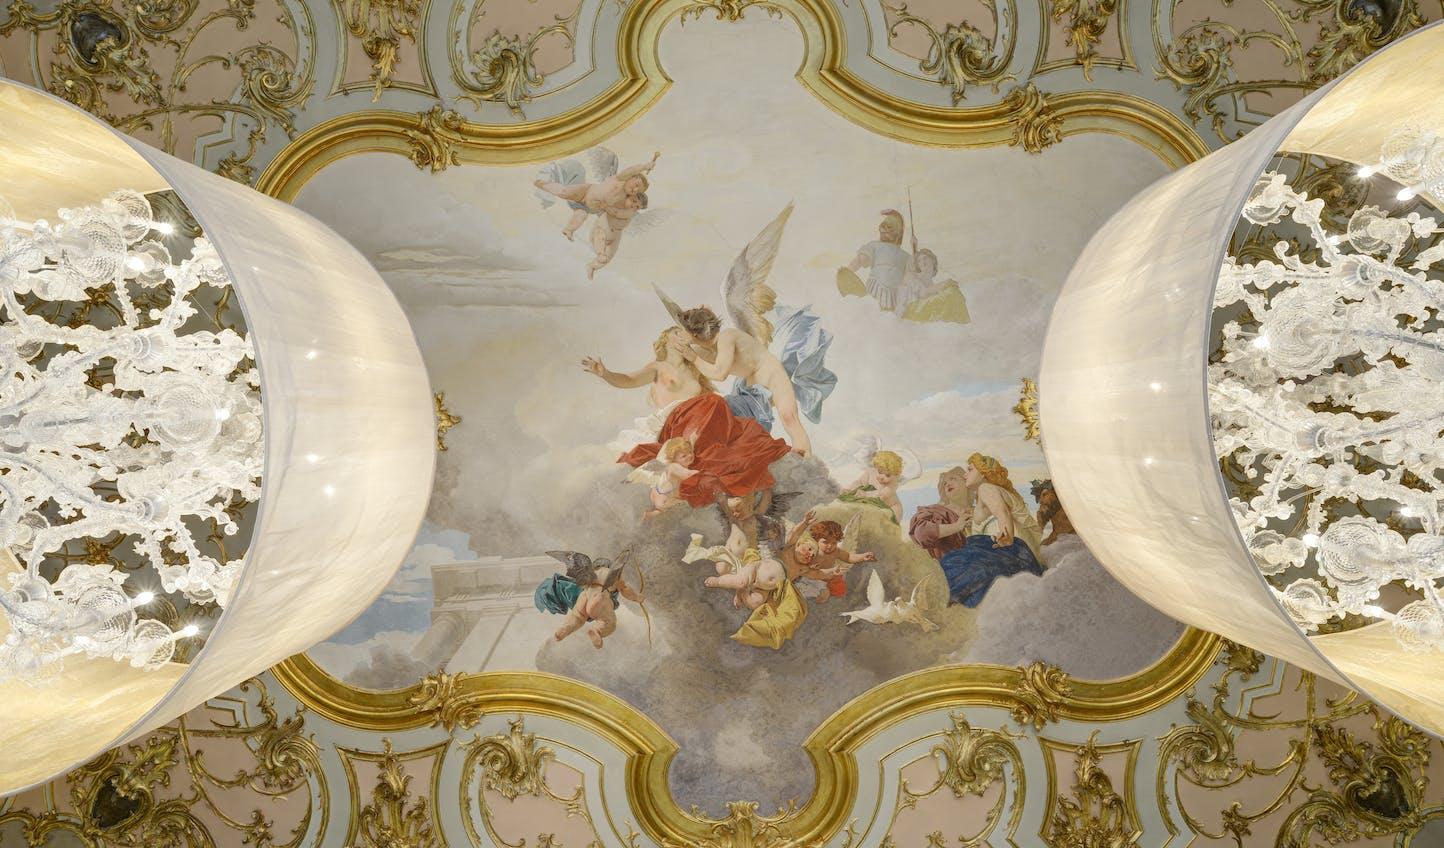 Original fresco at Villa Cora, Florence